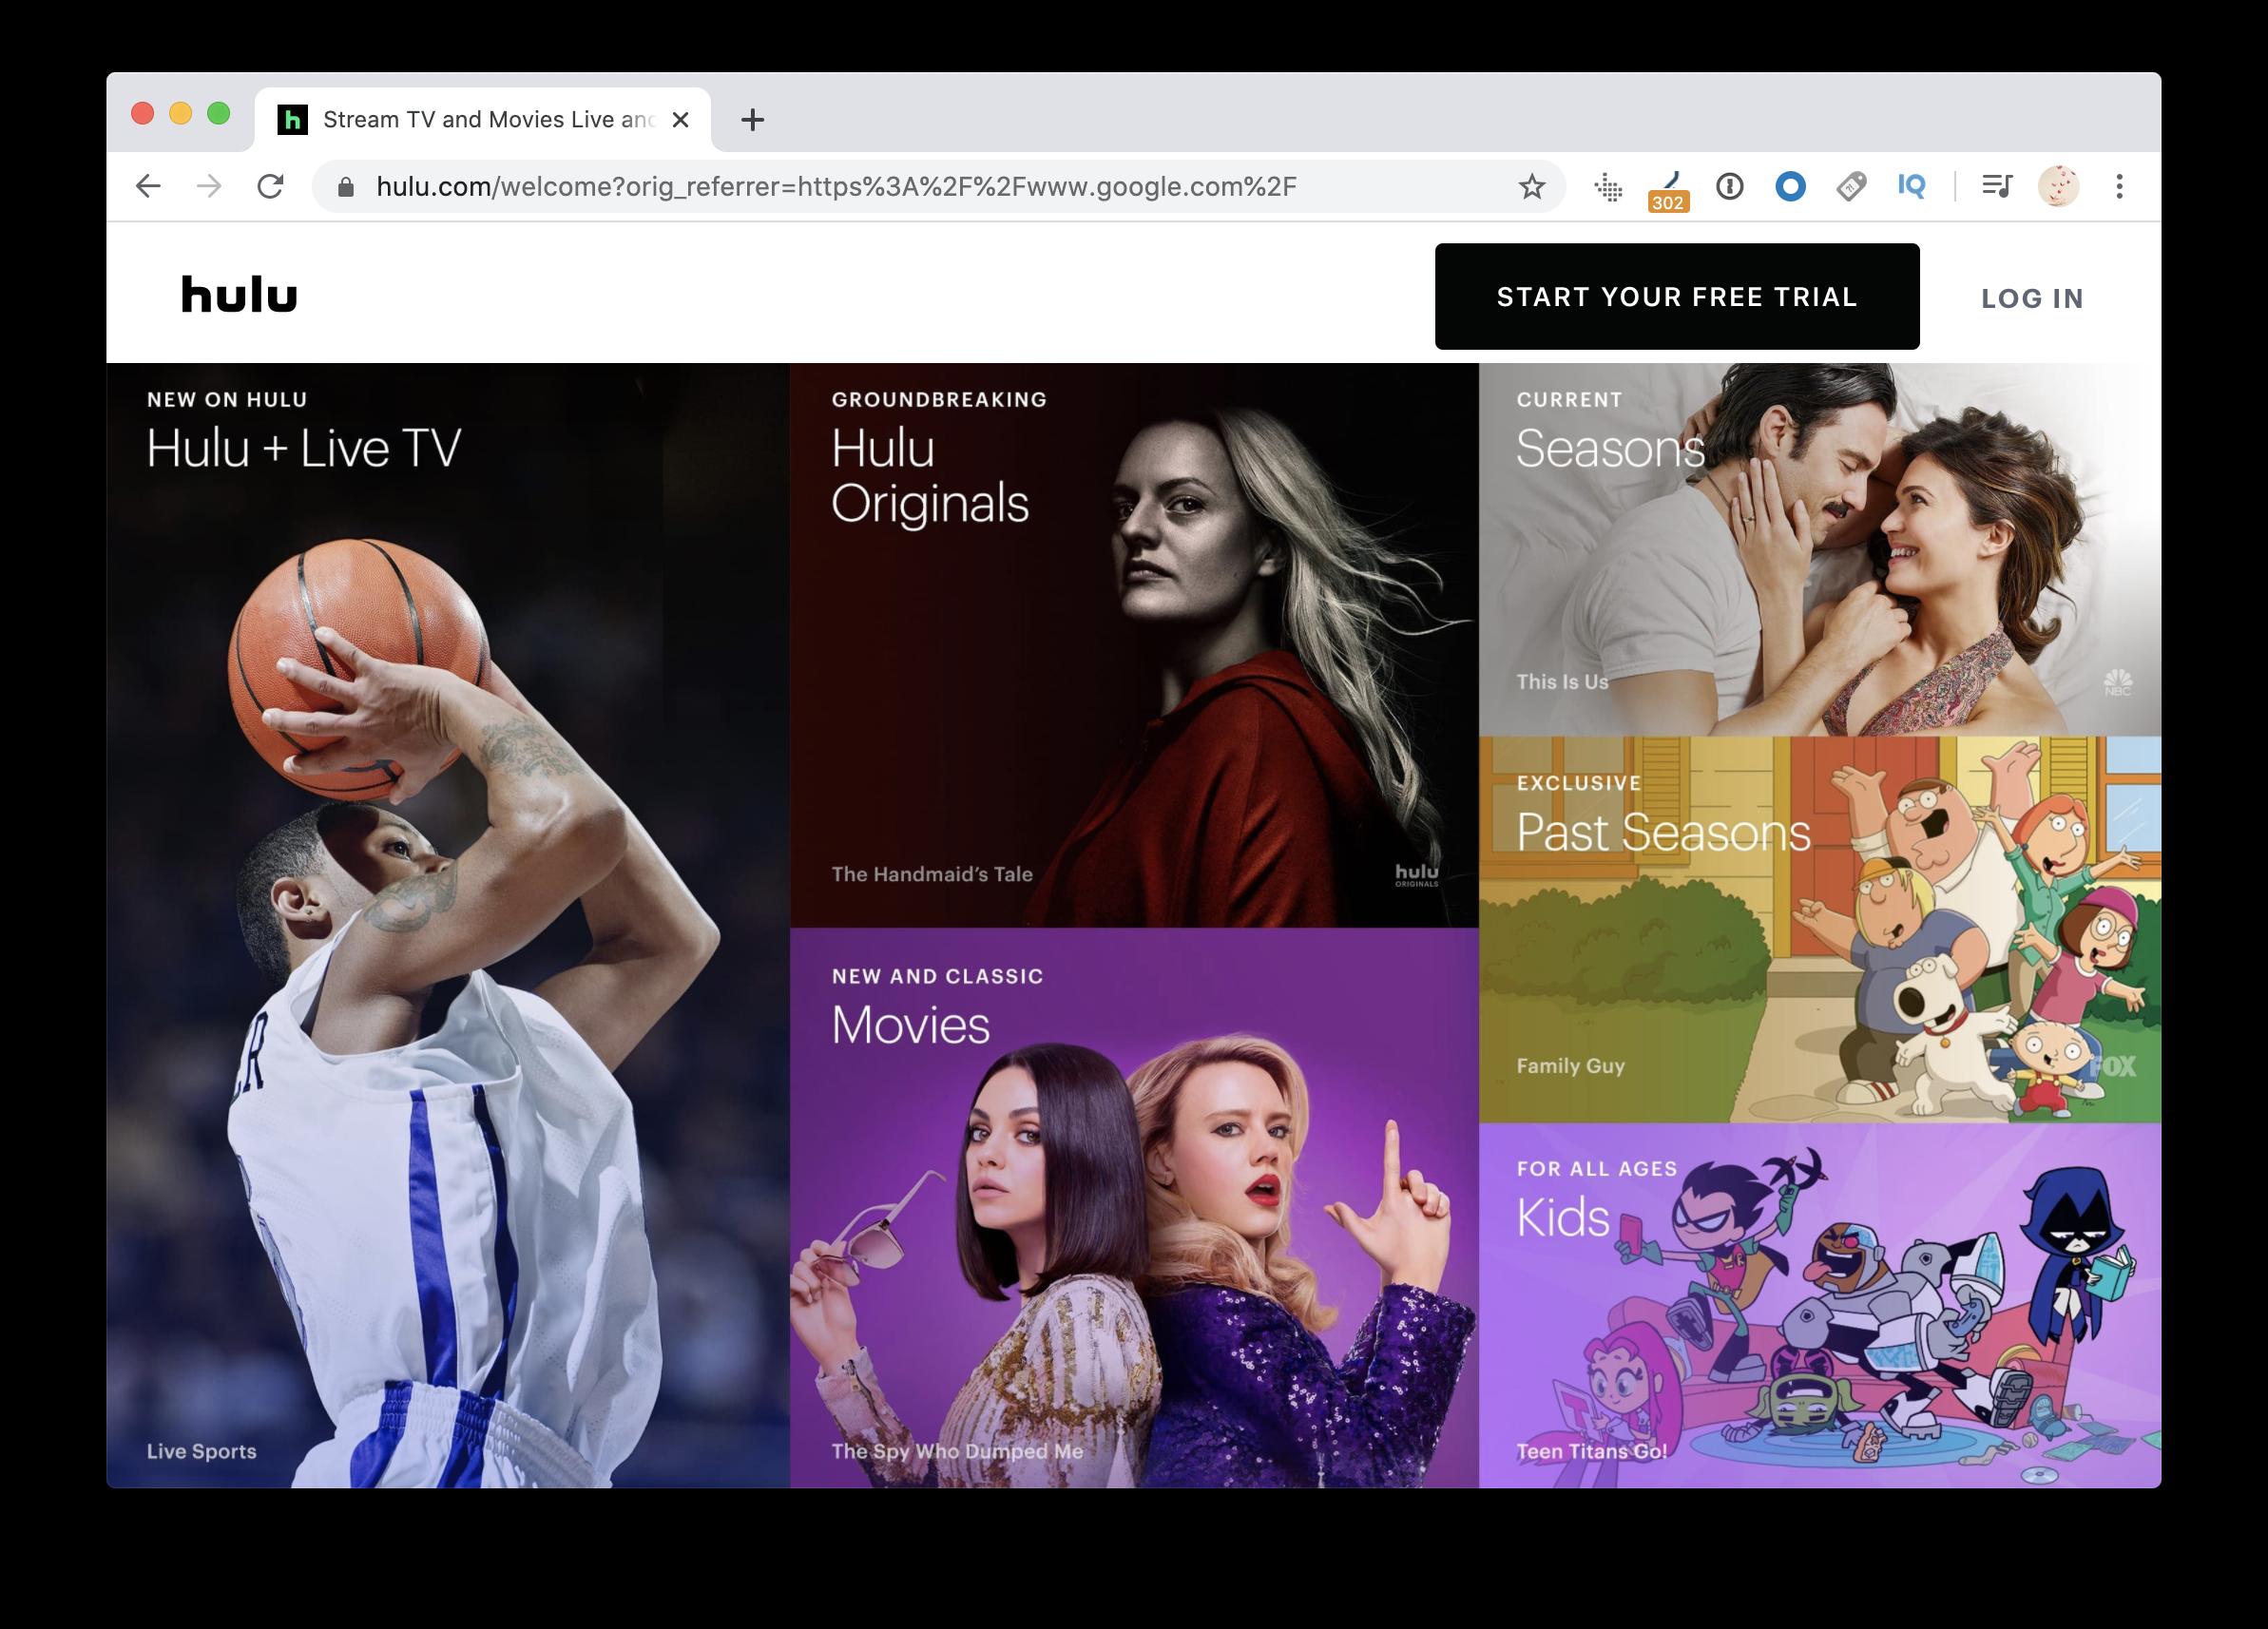 Most popular Hulu content